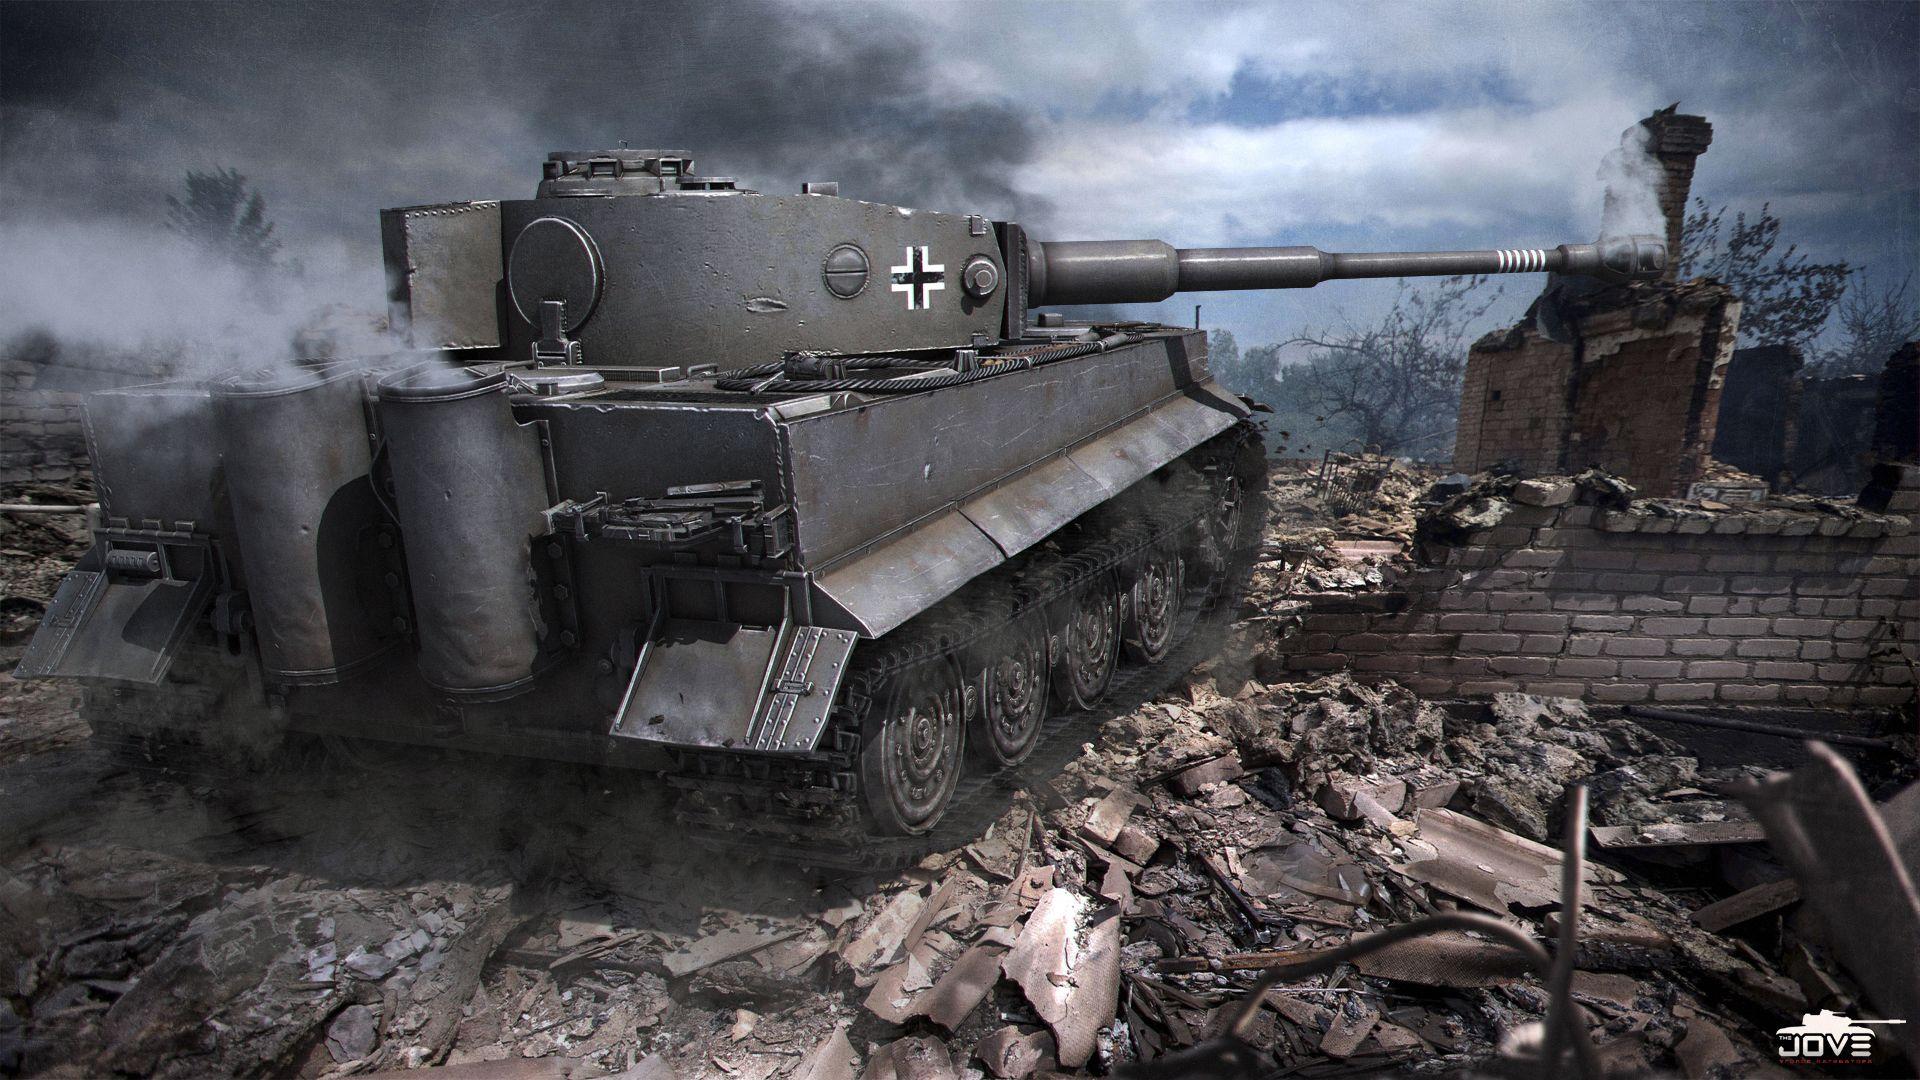 World Of Tanks Wargaming Video Games Tiger Ii E Wallpapers Tank Wallpaper Tiger Tank Tanks Military